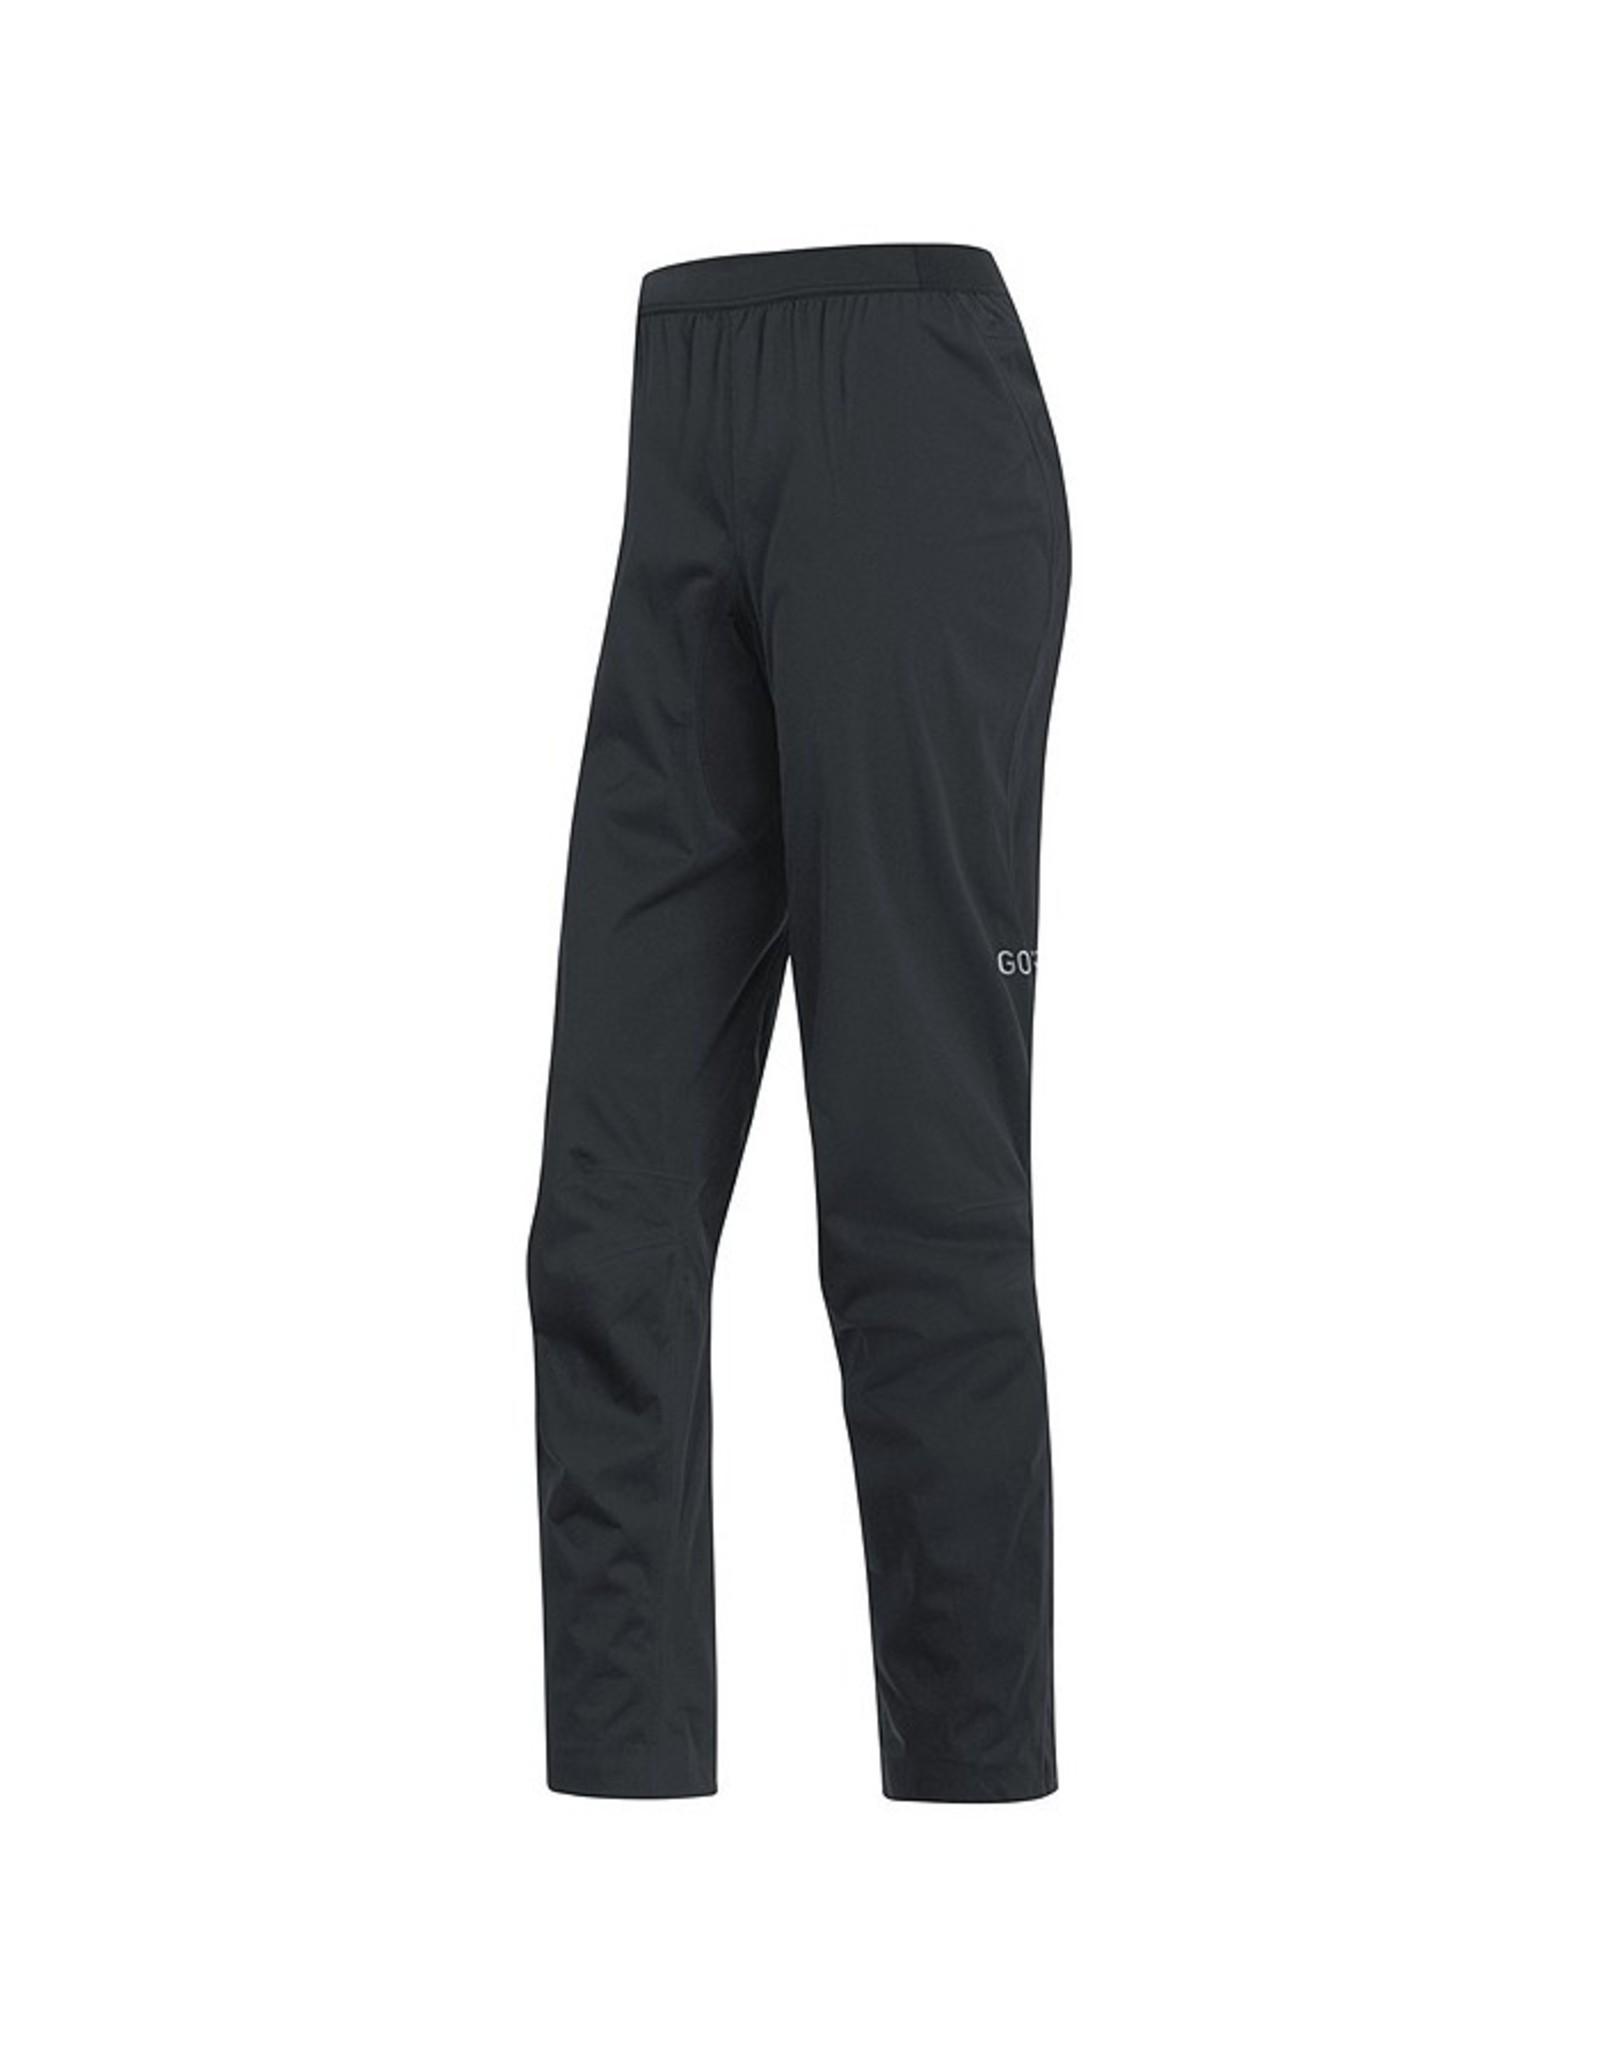 GORE Wear Gore C3 Gore-Tex Active Pants